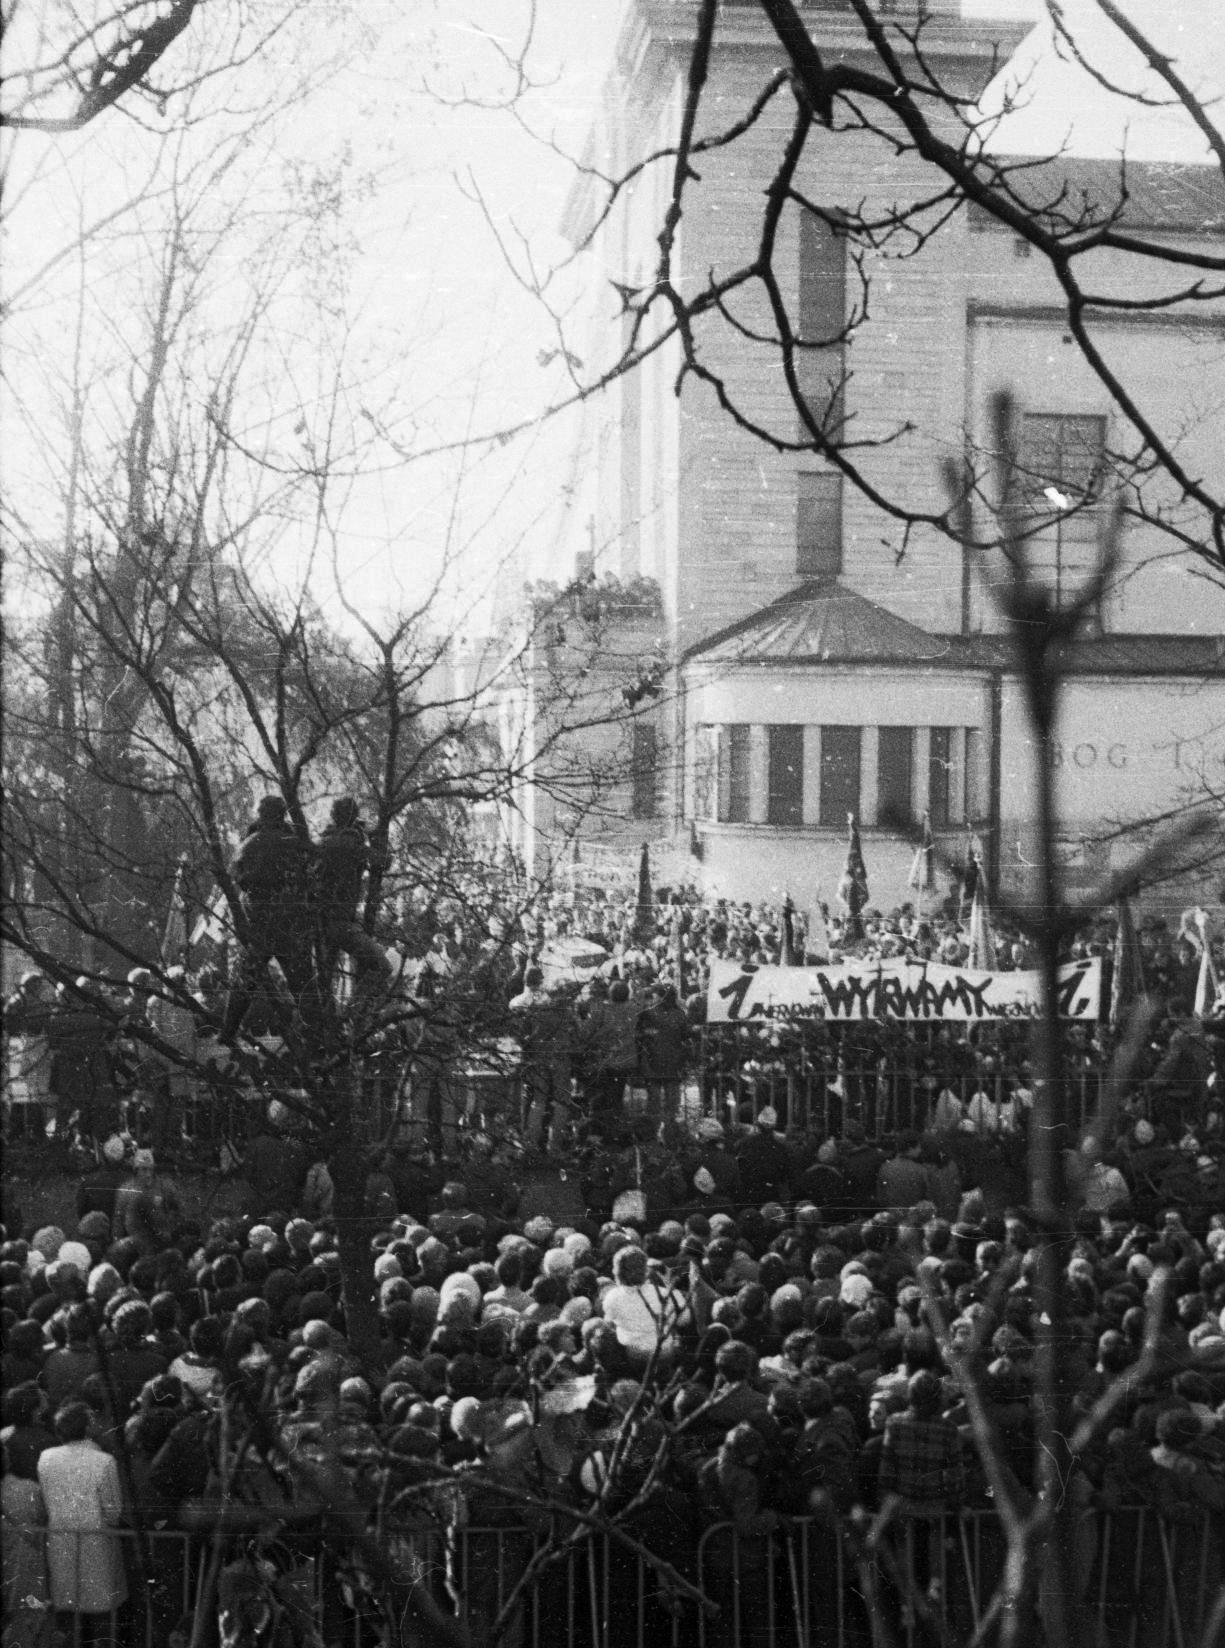 upload.wikimedia.org/wikipedia/commons/f/f5/Jerzy_Popieluszko_Funeral_-_37.jpg